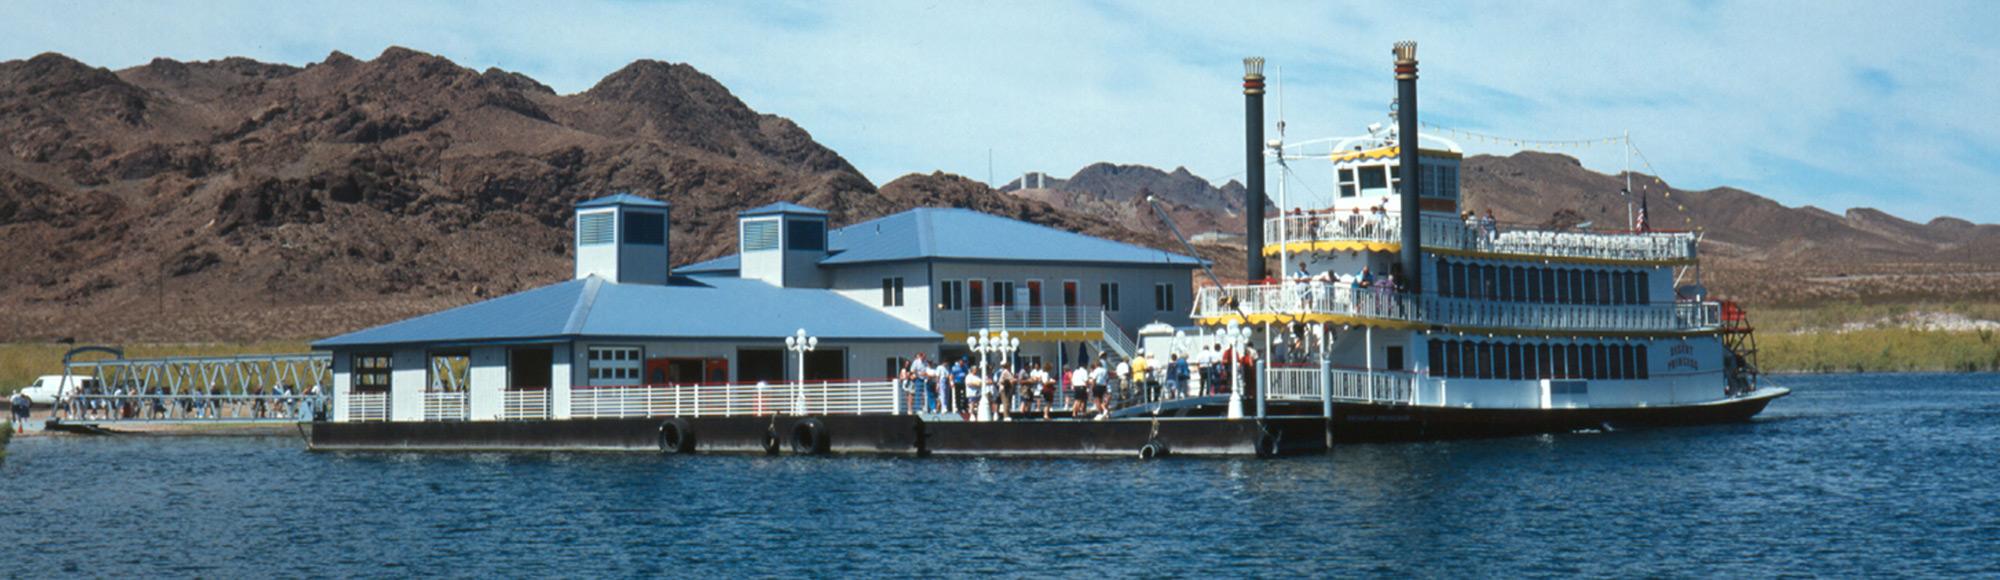 Lake Mead Cruises tour